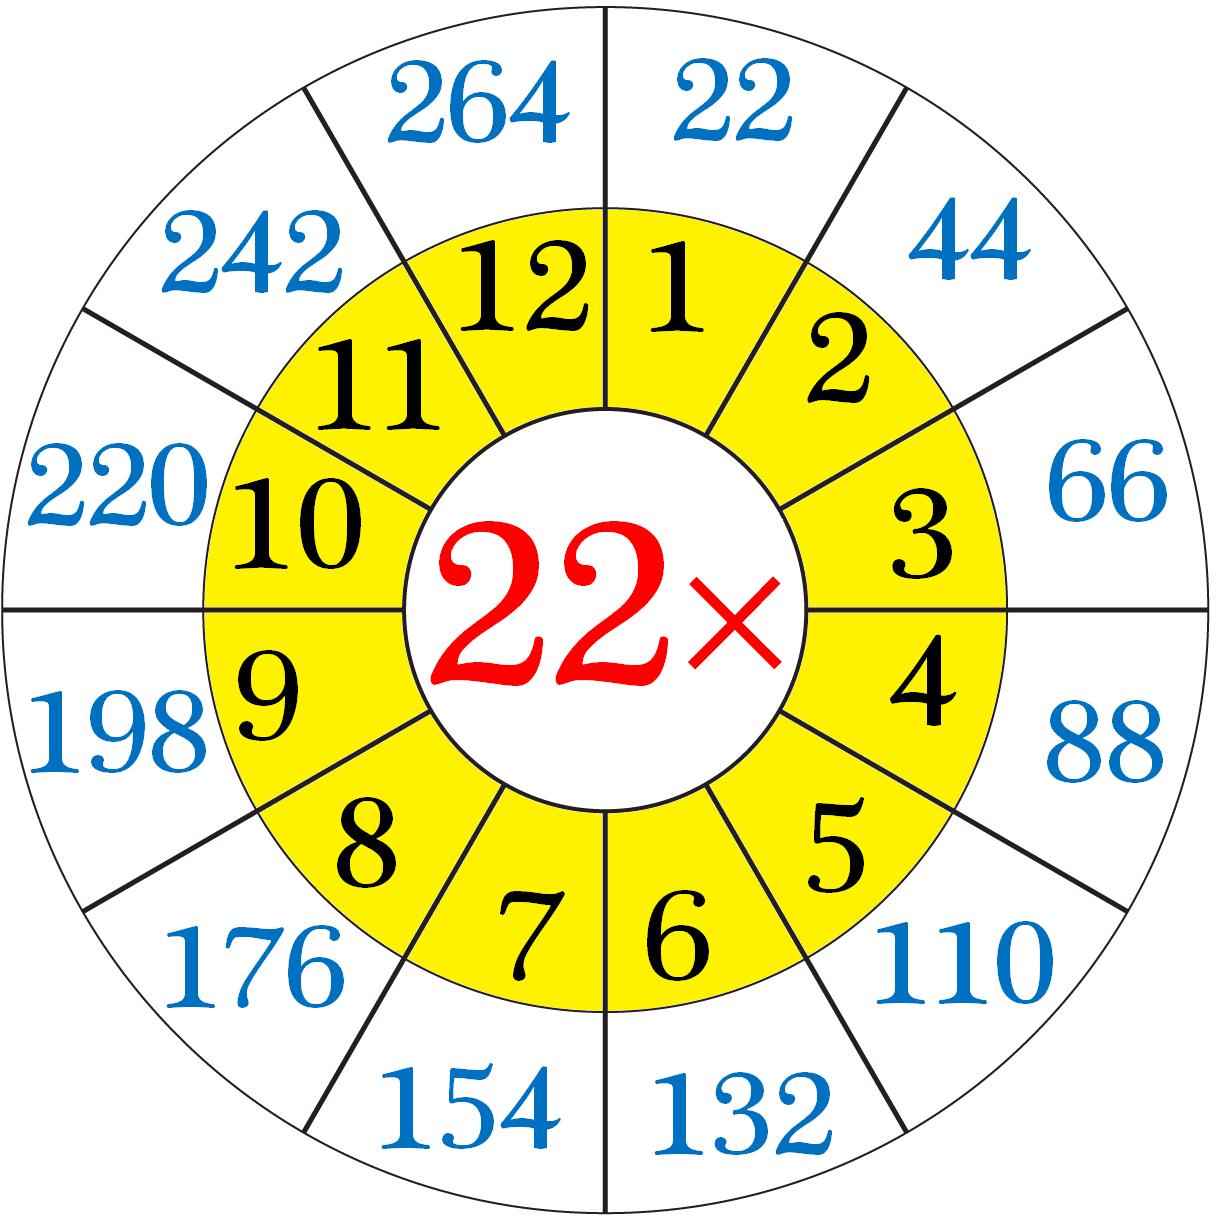 Multiplication Table of Twenty-Two